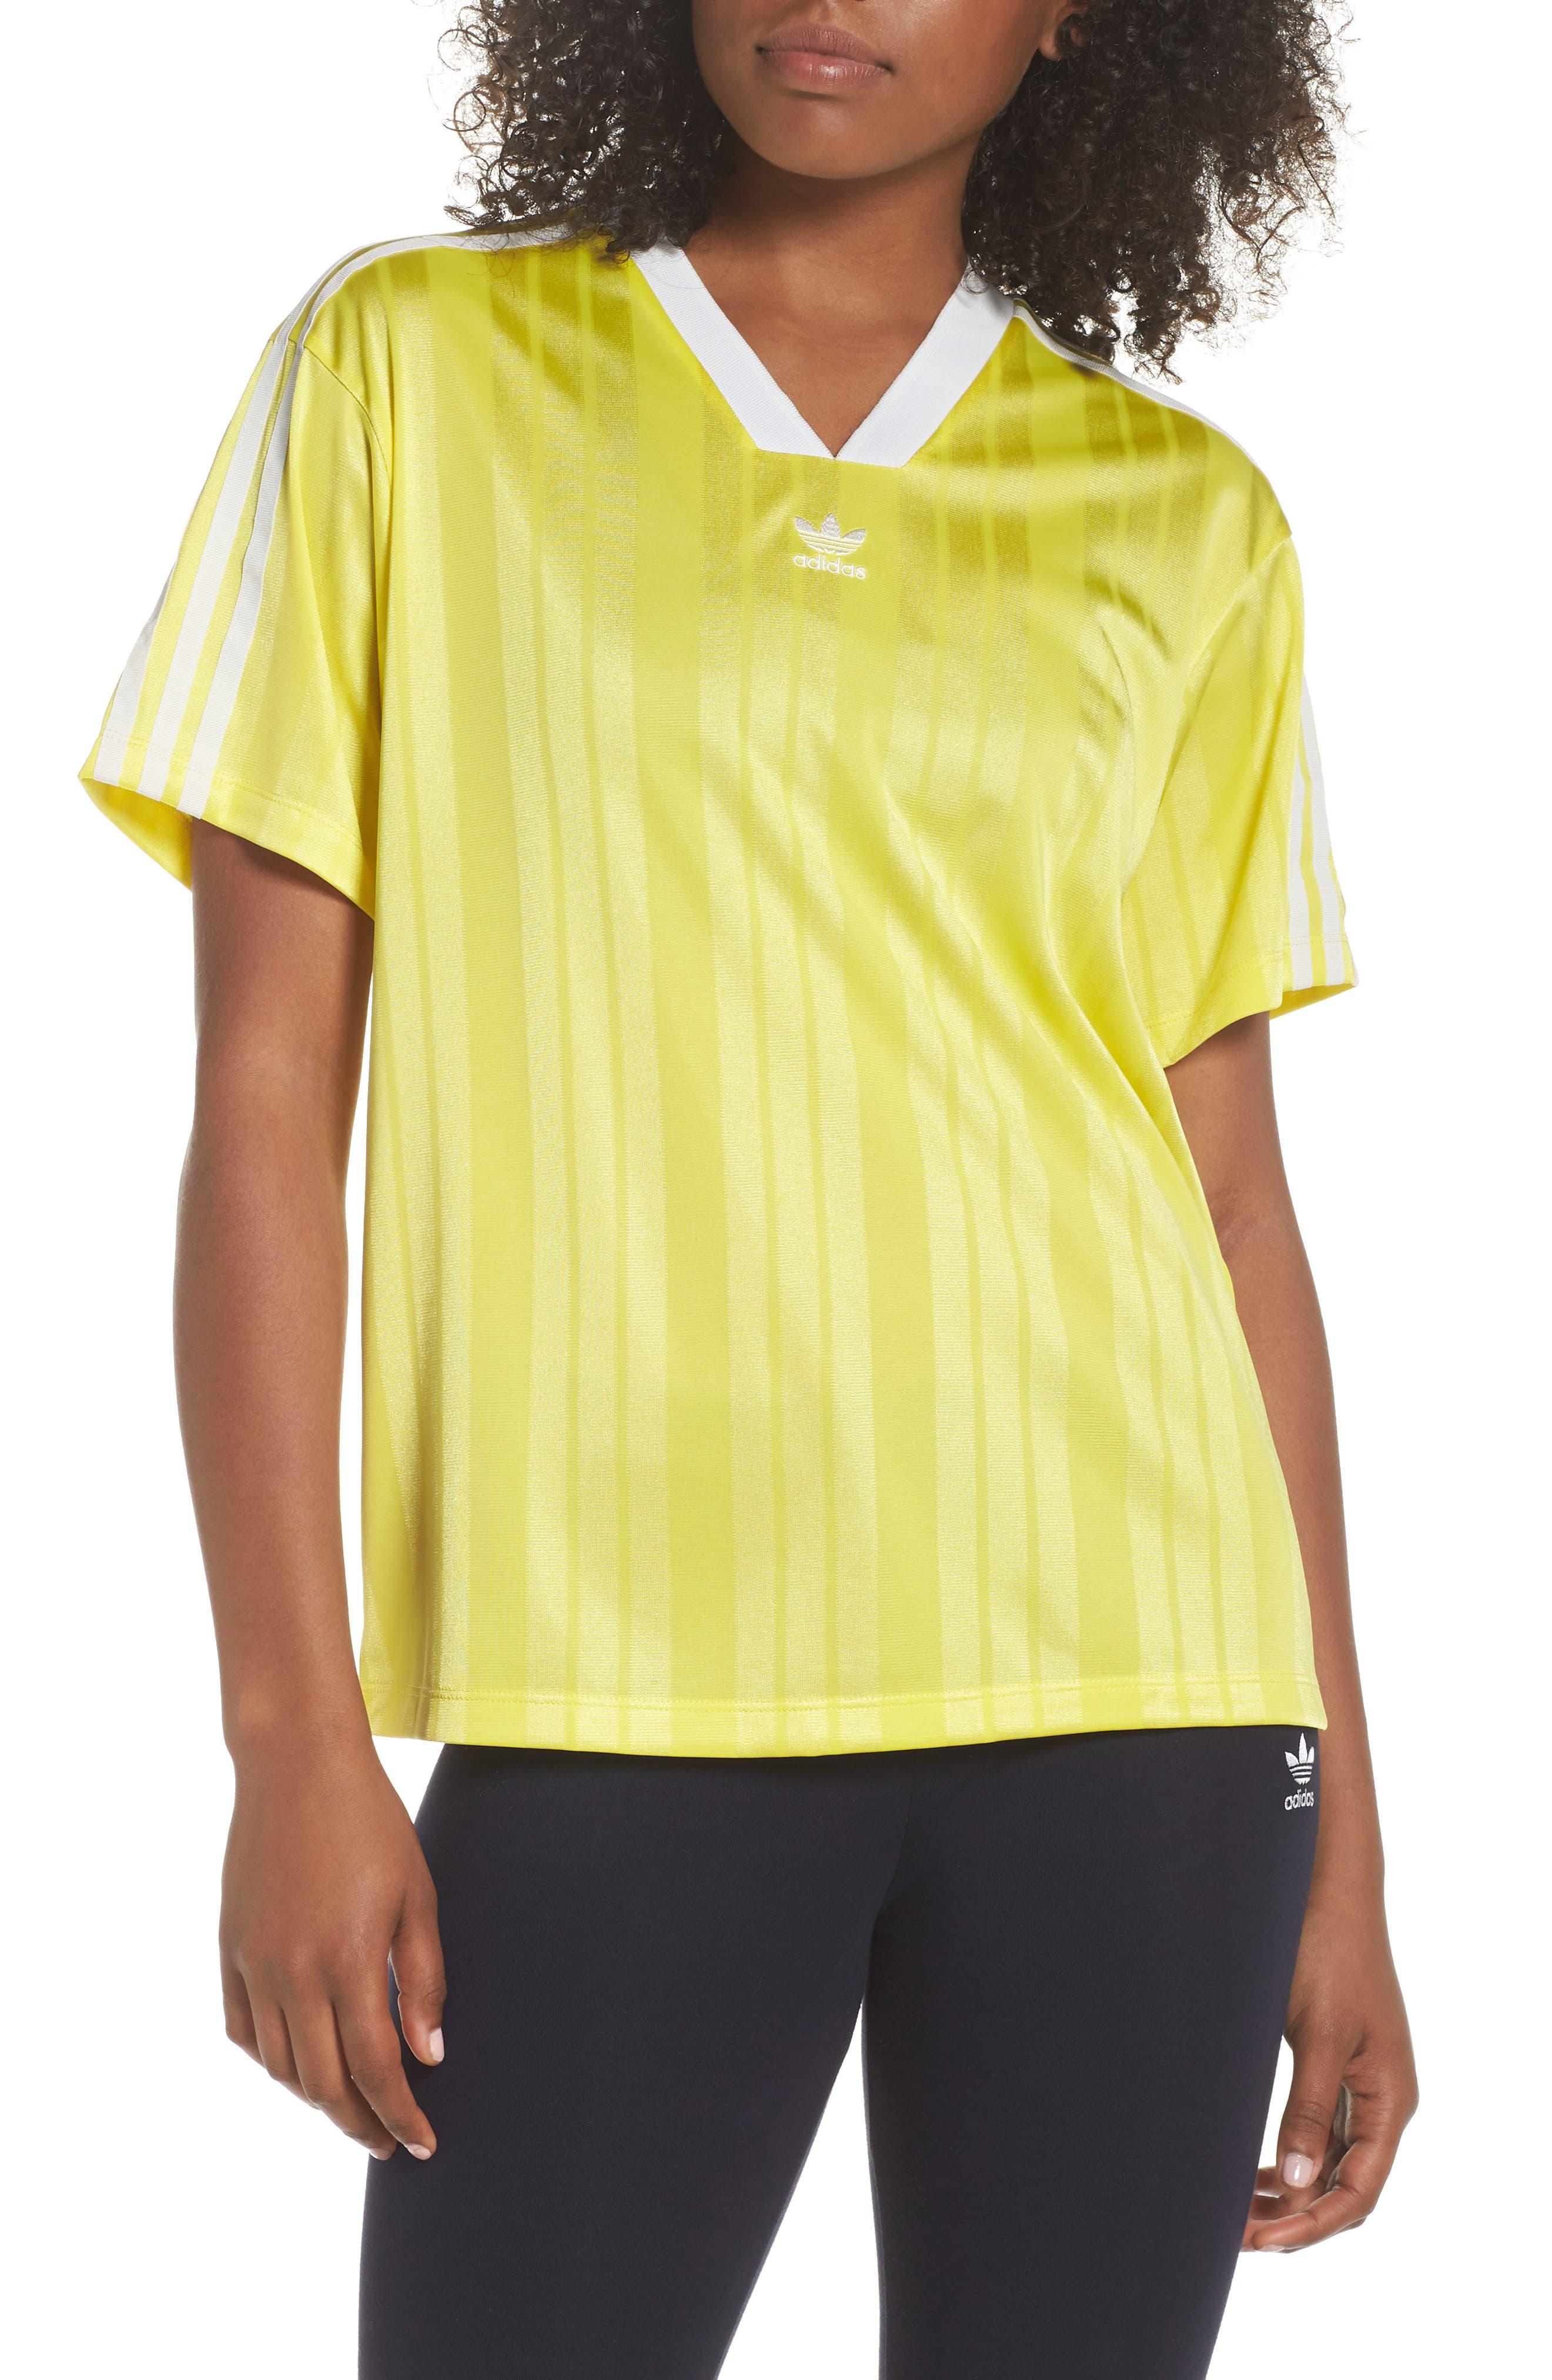 Originals Fashion League Jersey Tee,                         Main,                         color, Prime Yellow